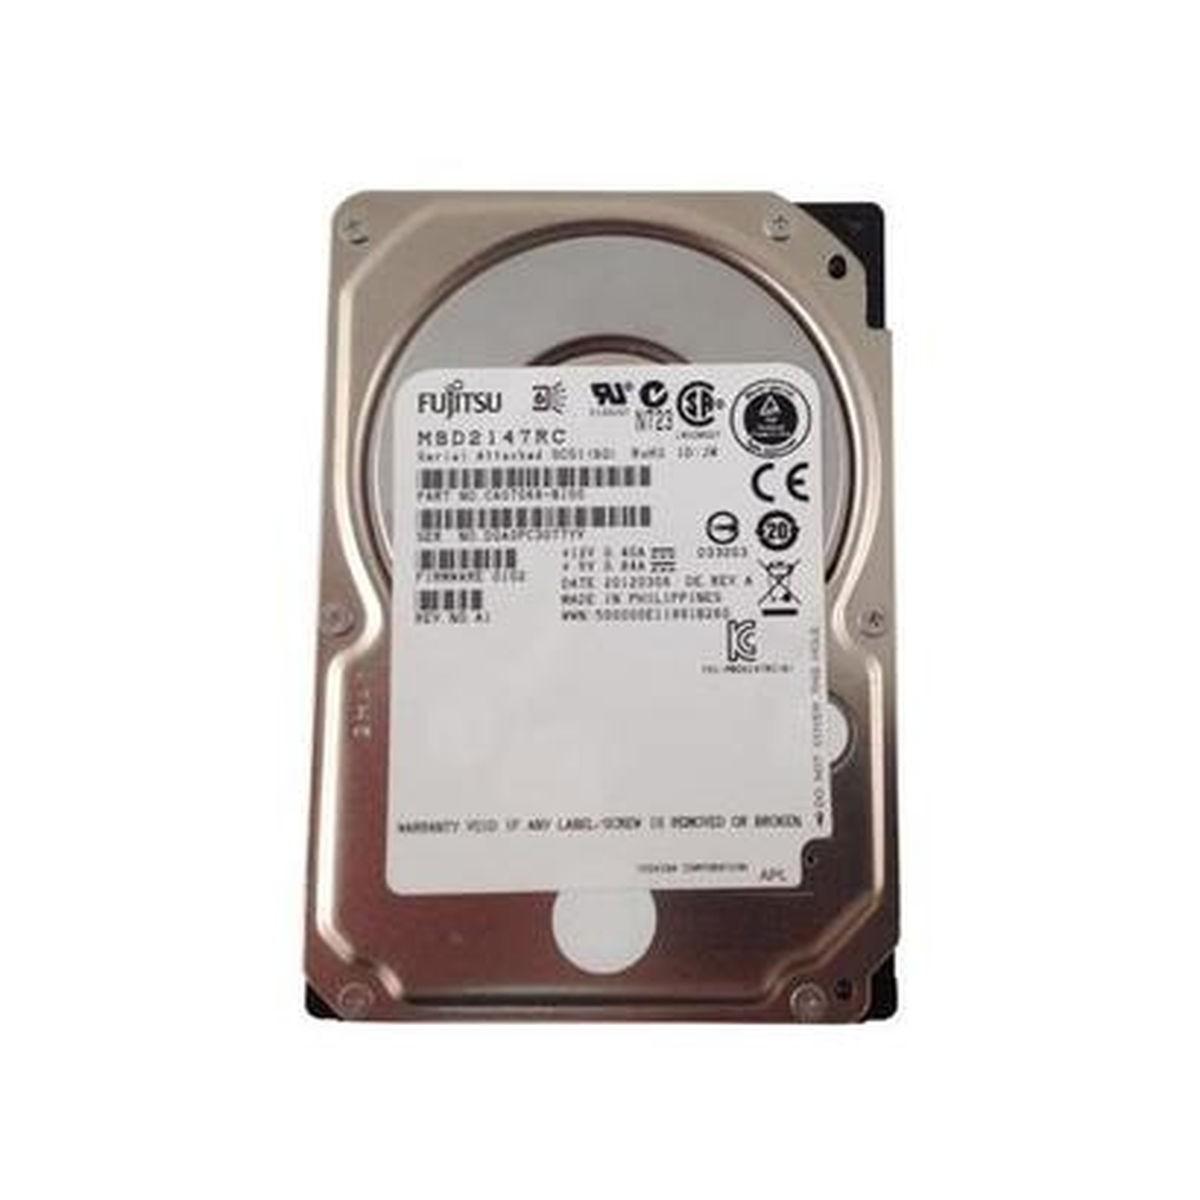 PAMIEC HP 2GB PC3200R 400MHZ DDR ECC 373030-051